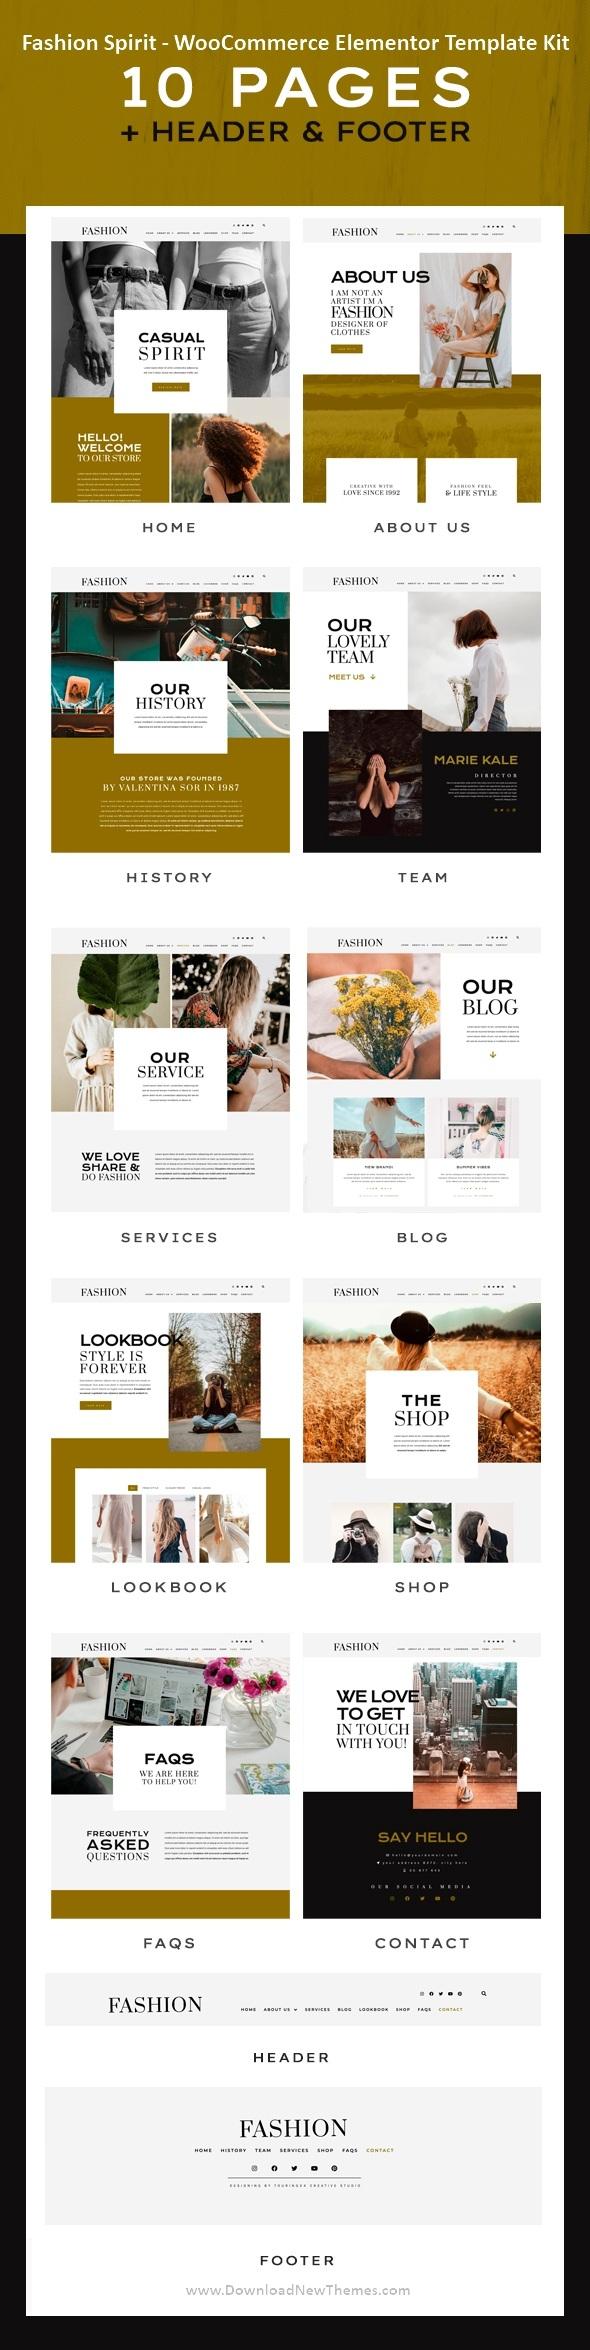 Fashion WooCommerce Elementor Template Kit